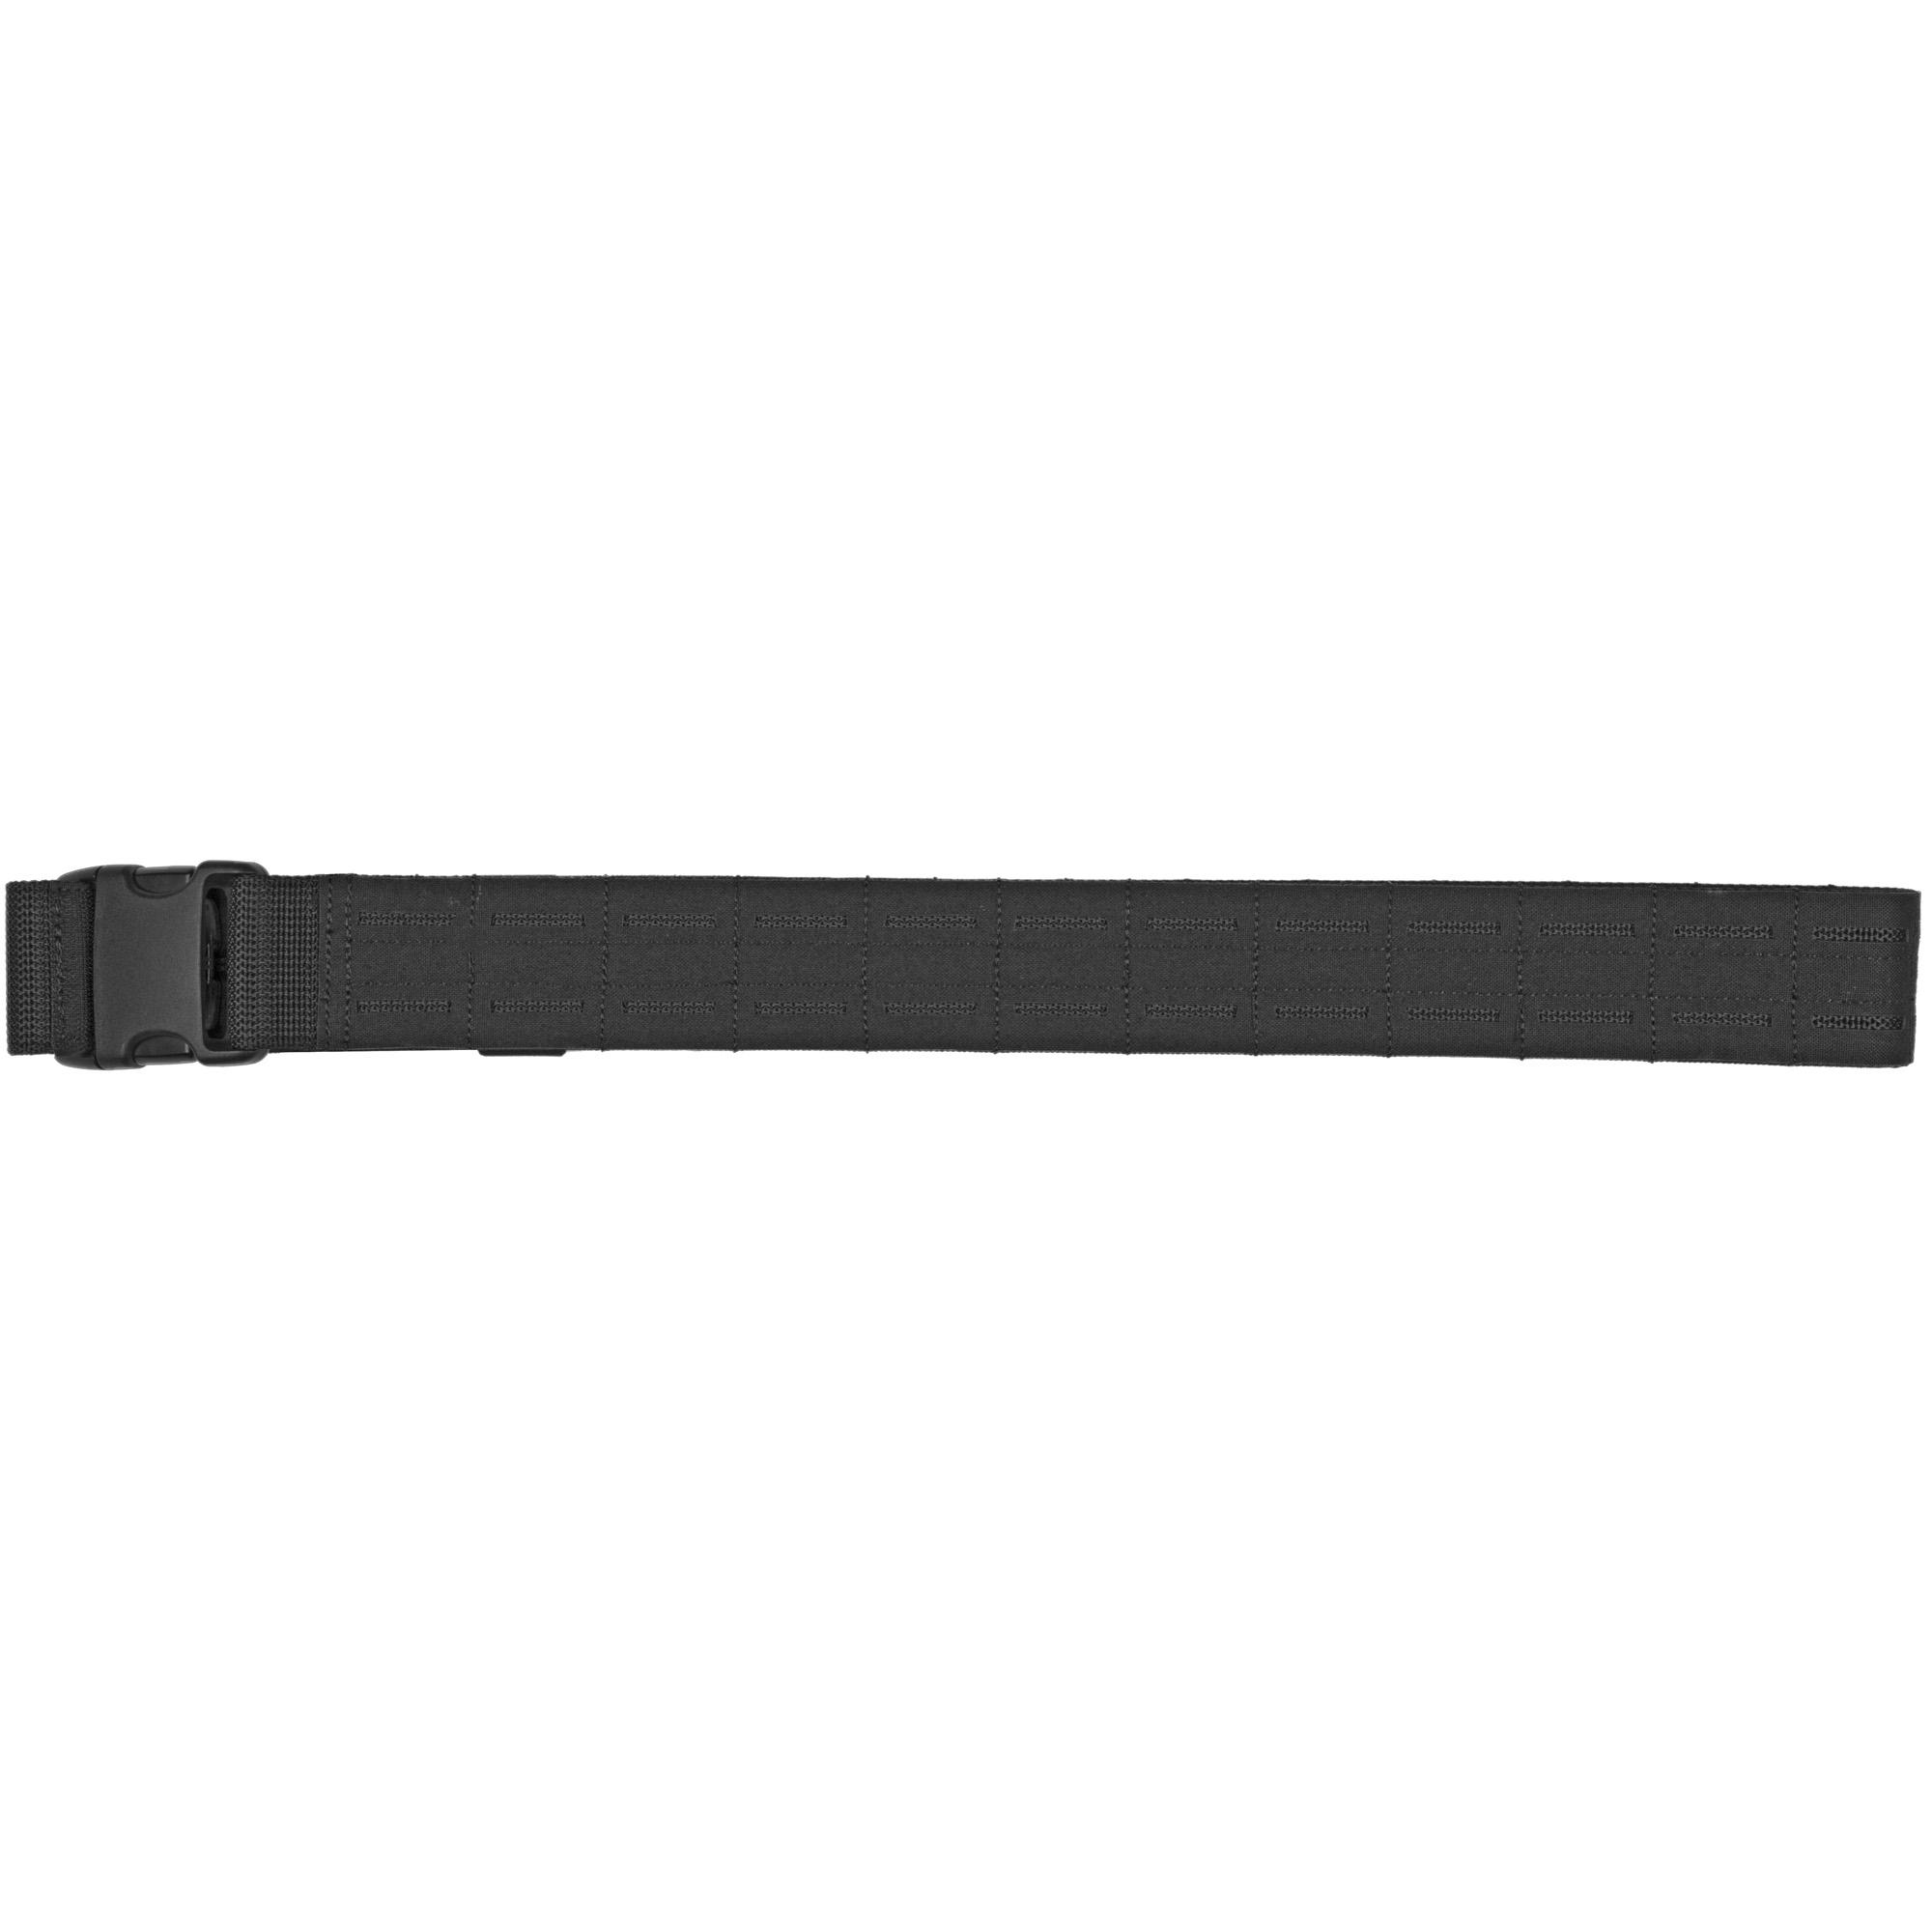 "Bh Foundation Belt Lg 39""-44"" Black"